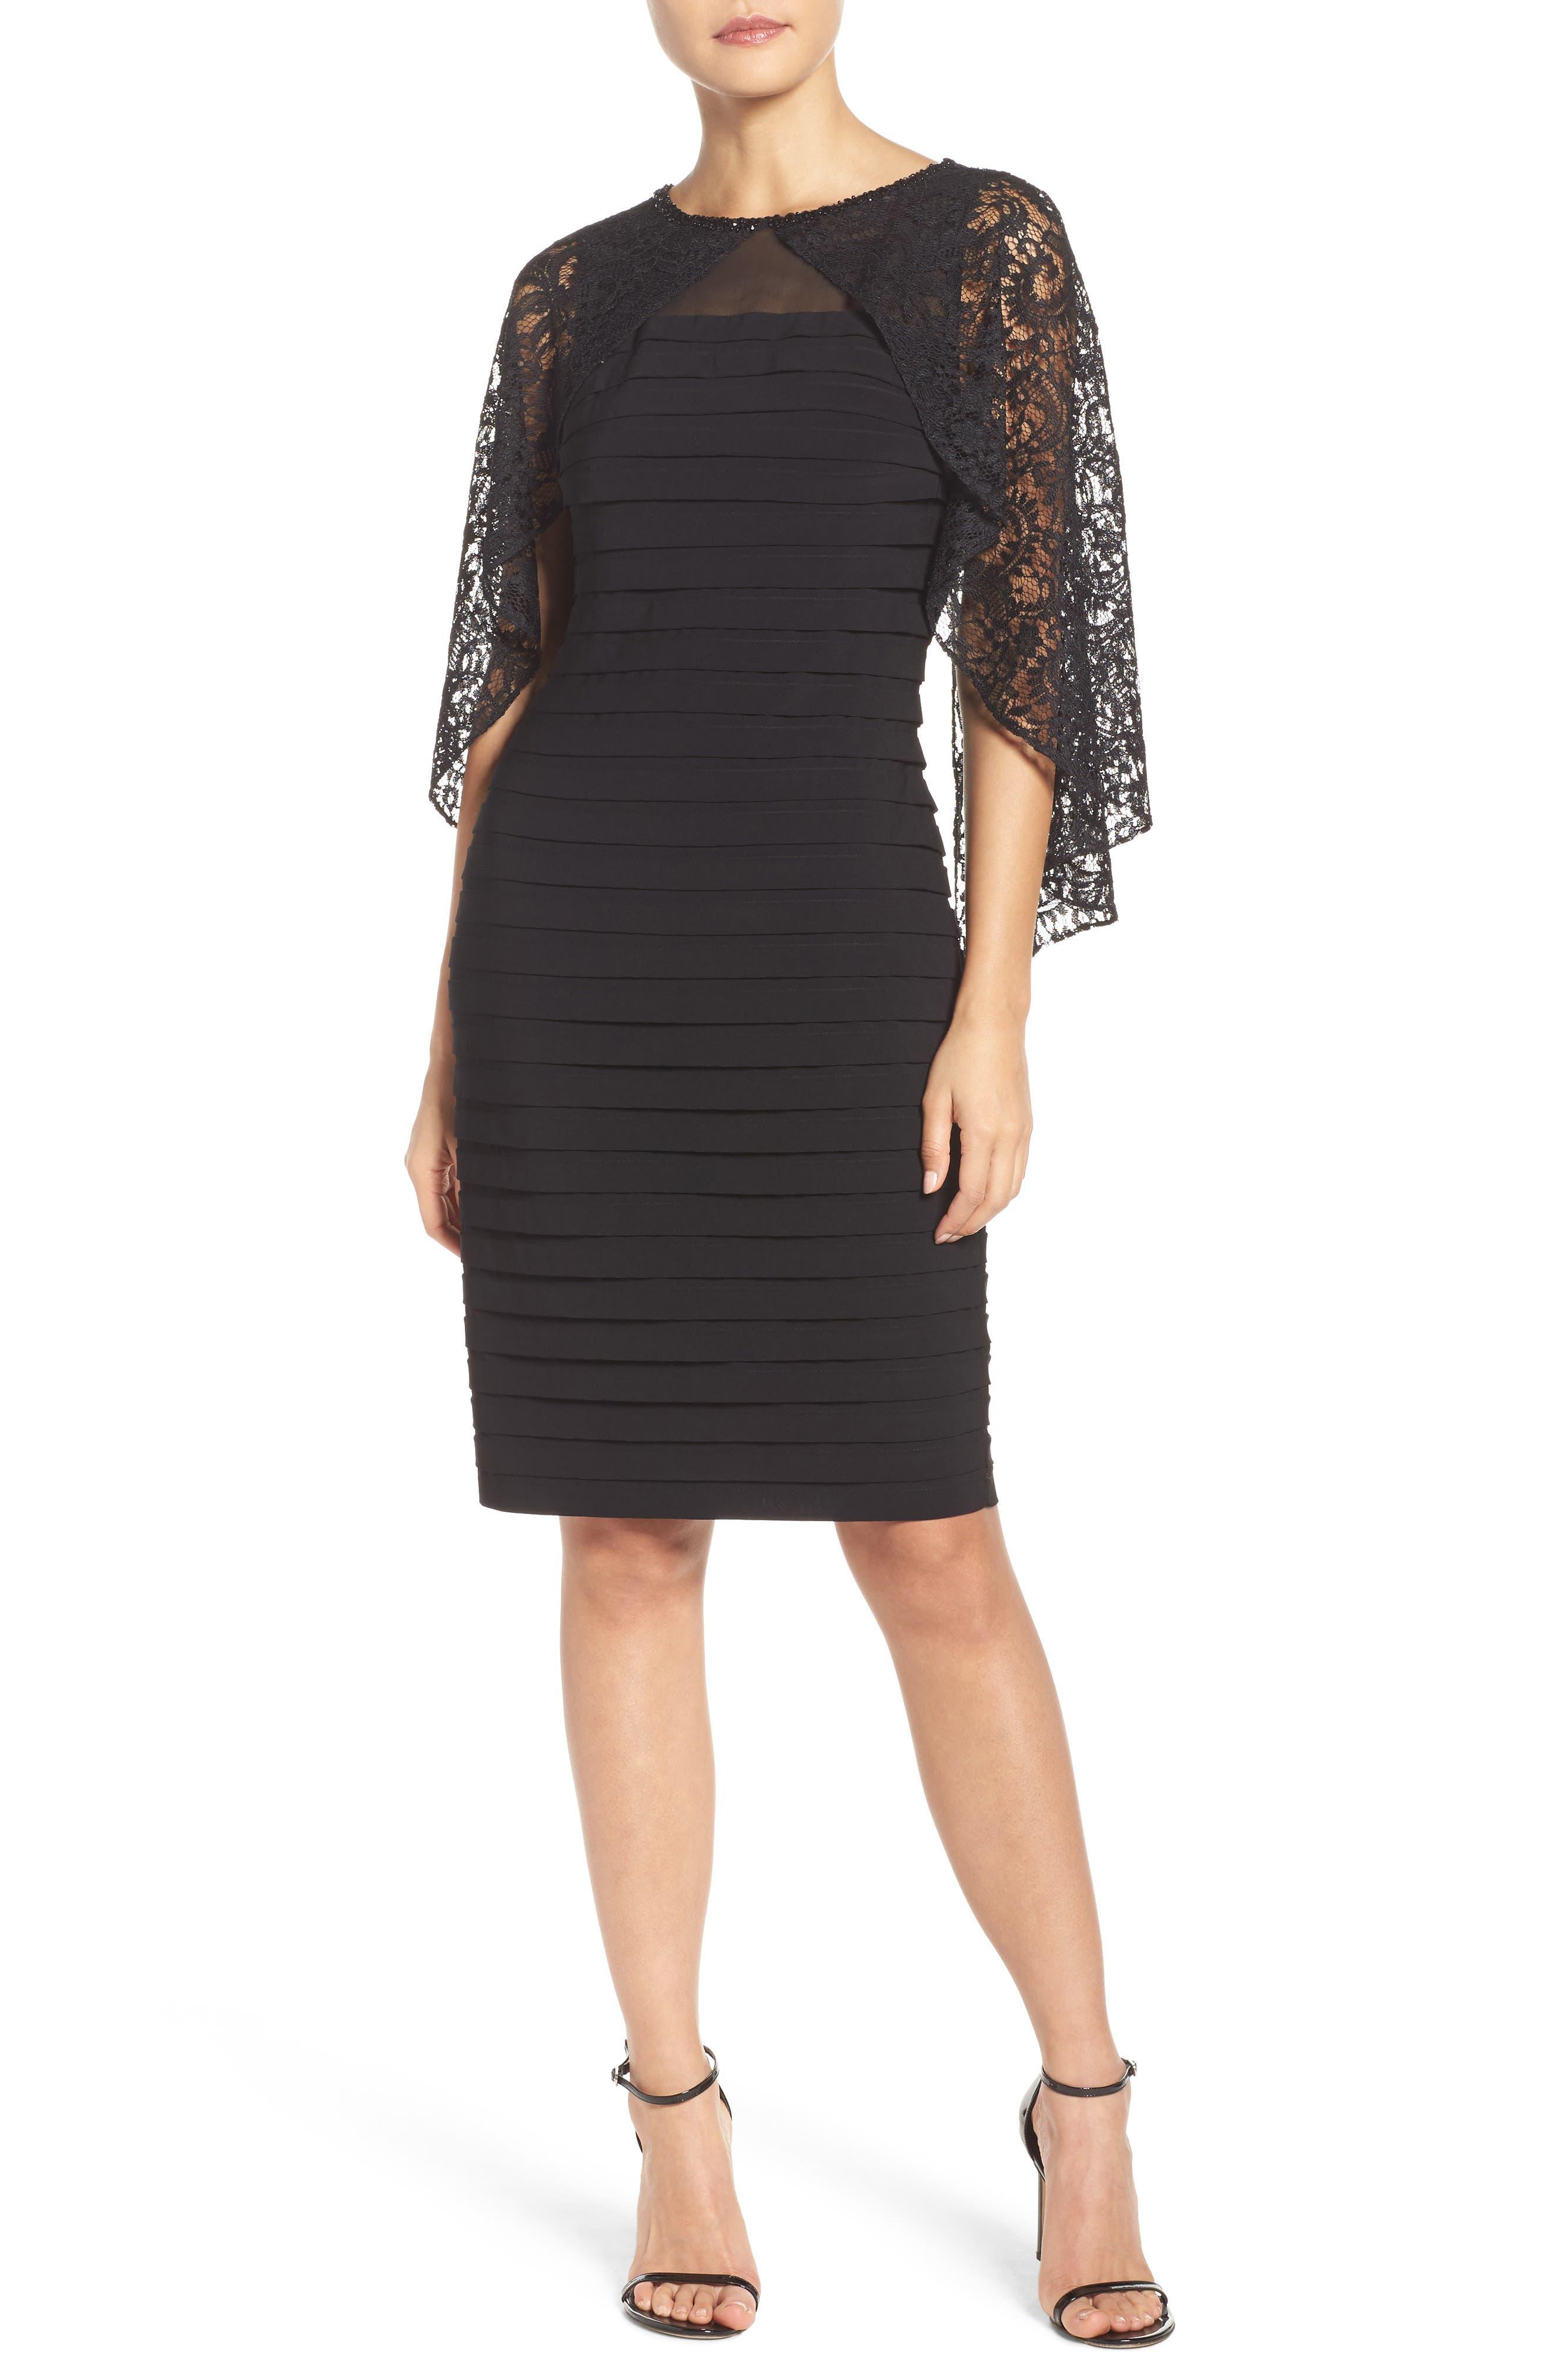 ADRIANNA PAPELL Cape Dress, Main, color, 002